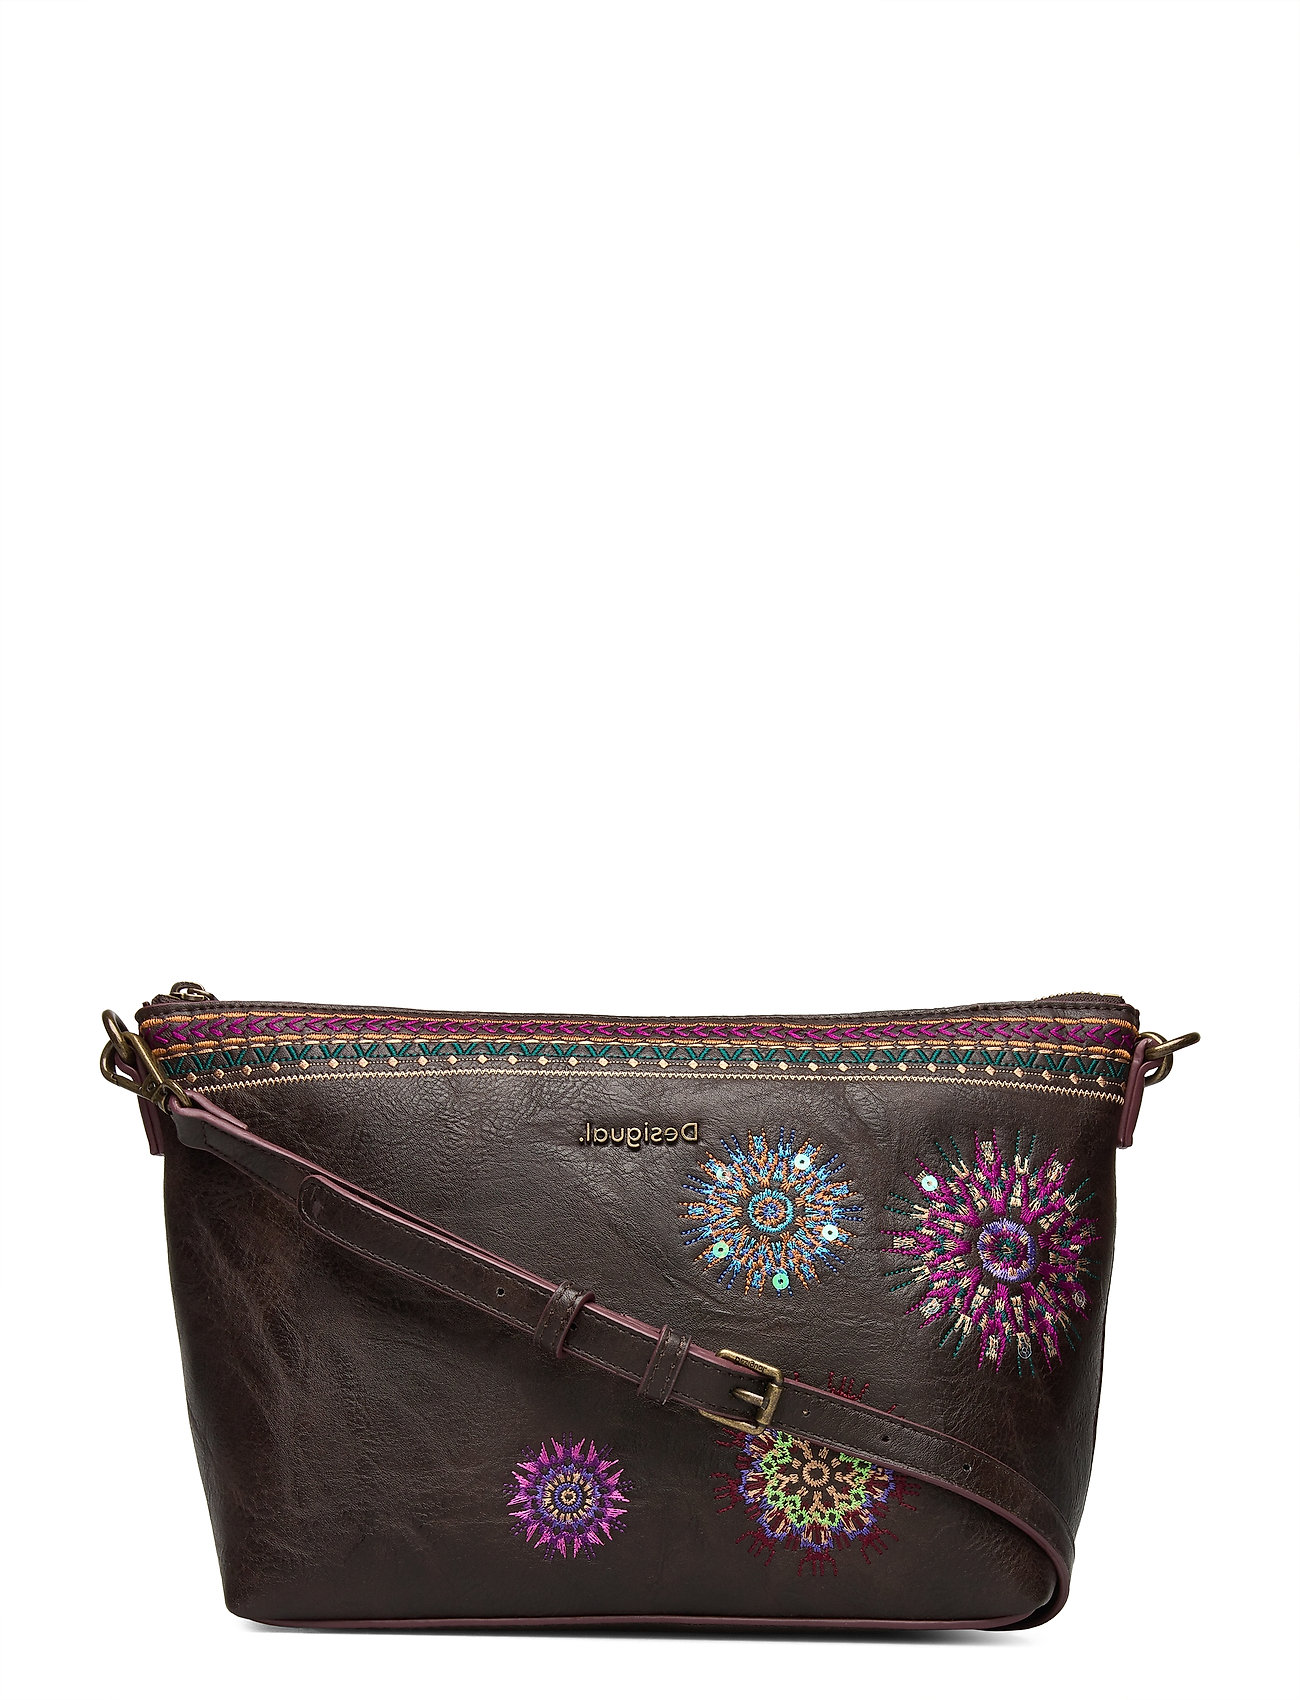 Image of Bols Astoria Cata Bags Small Shoulder Bags - Crossbody Bags Brun Desigual Accessories (3452230271)